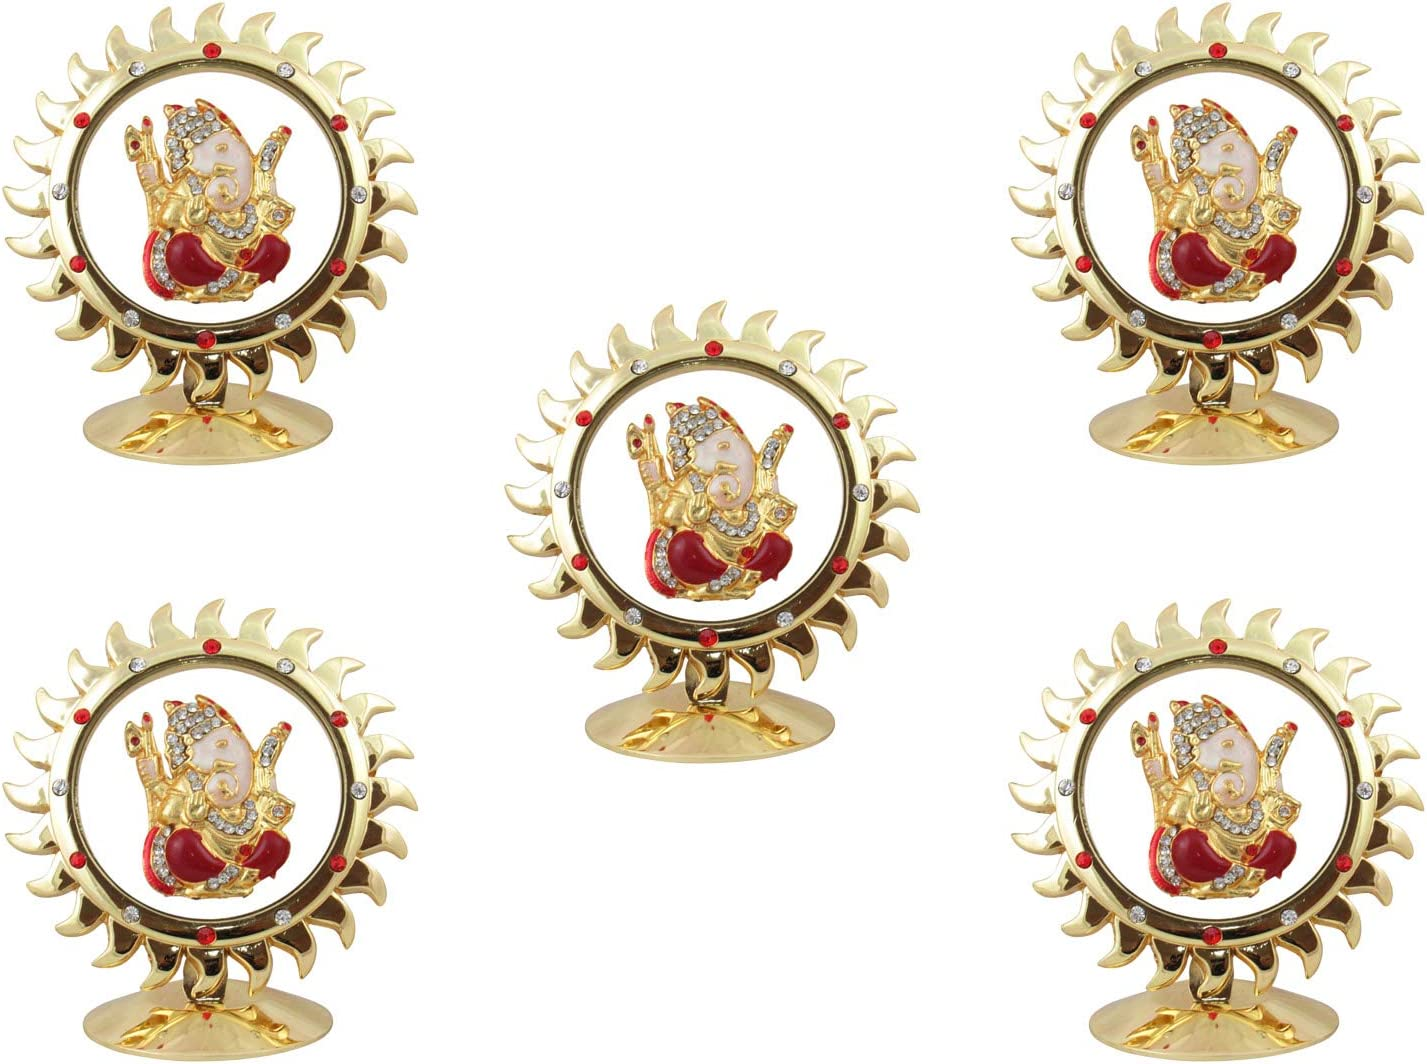 GoldGiftIdeas Sun Shape Siddhi Vinayak Ganesha for Car Dashboard (Medium), Idol for Table Decor, Return Gift for Housewarming and Baby Shower, Hindu Religious God Idol (Pack of 5)